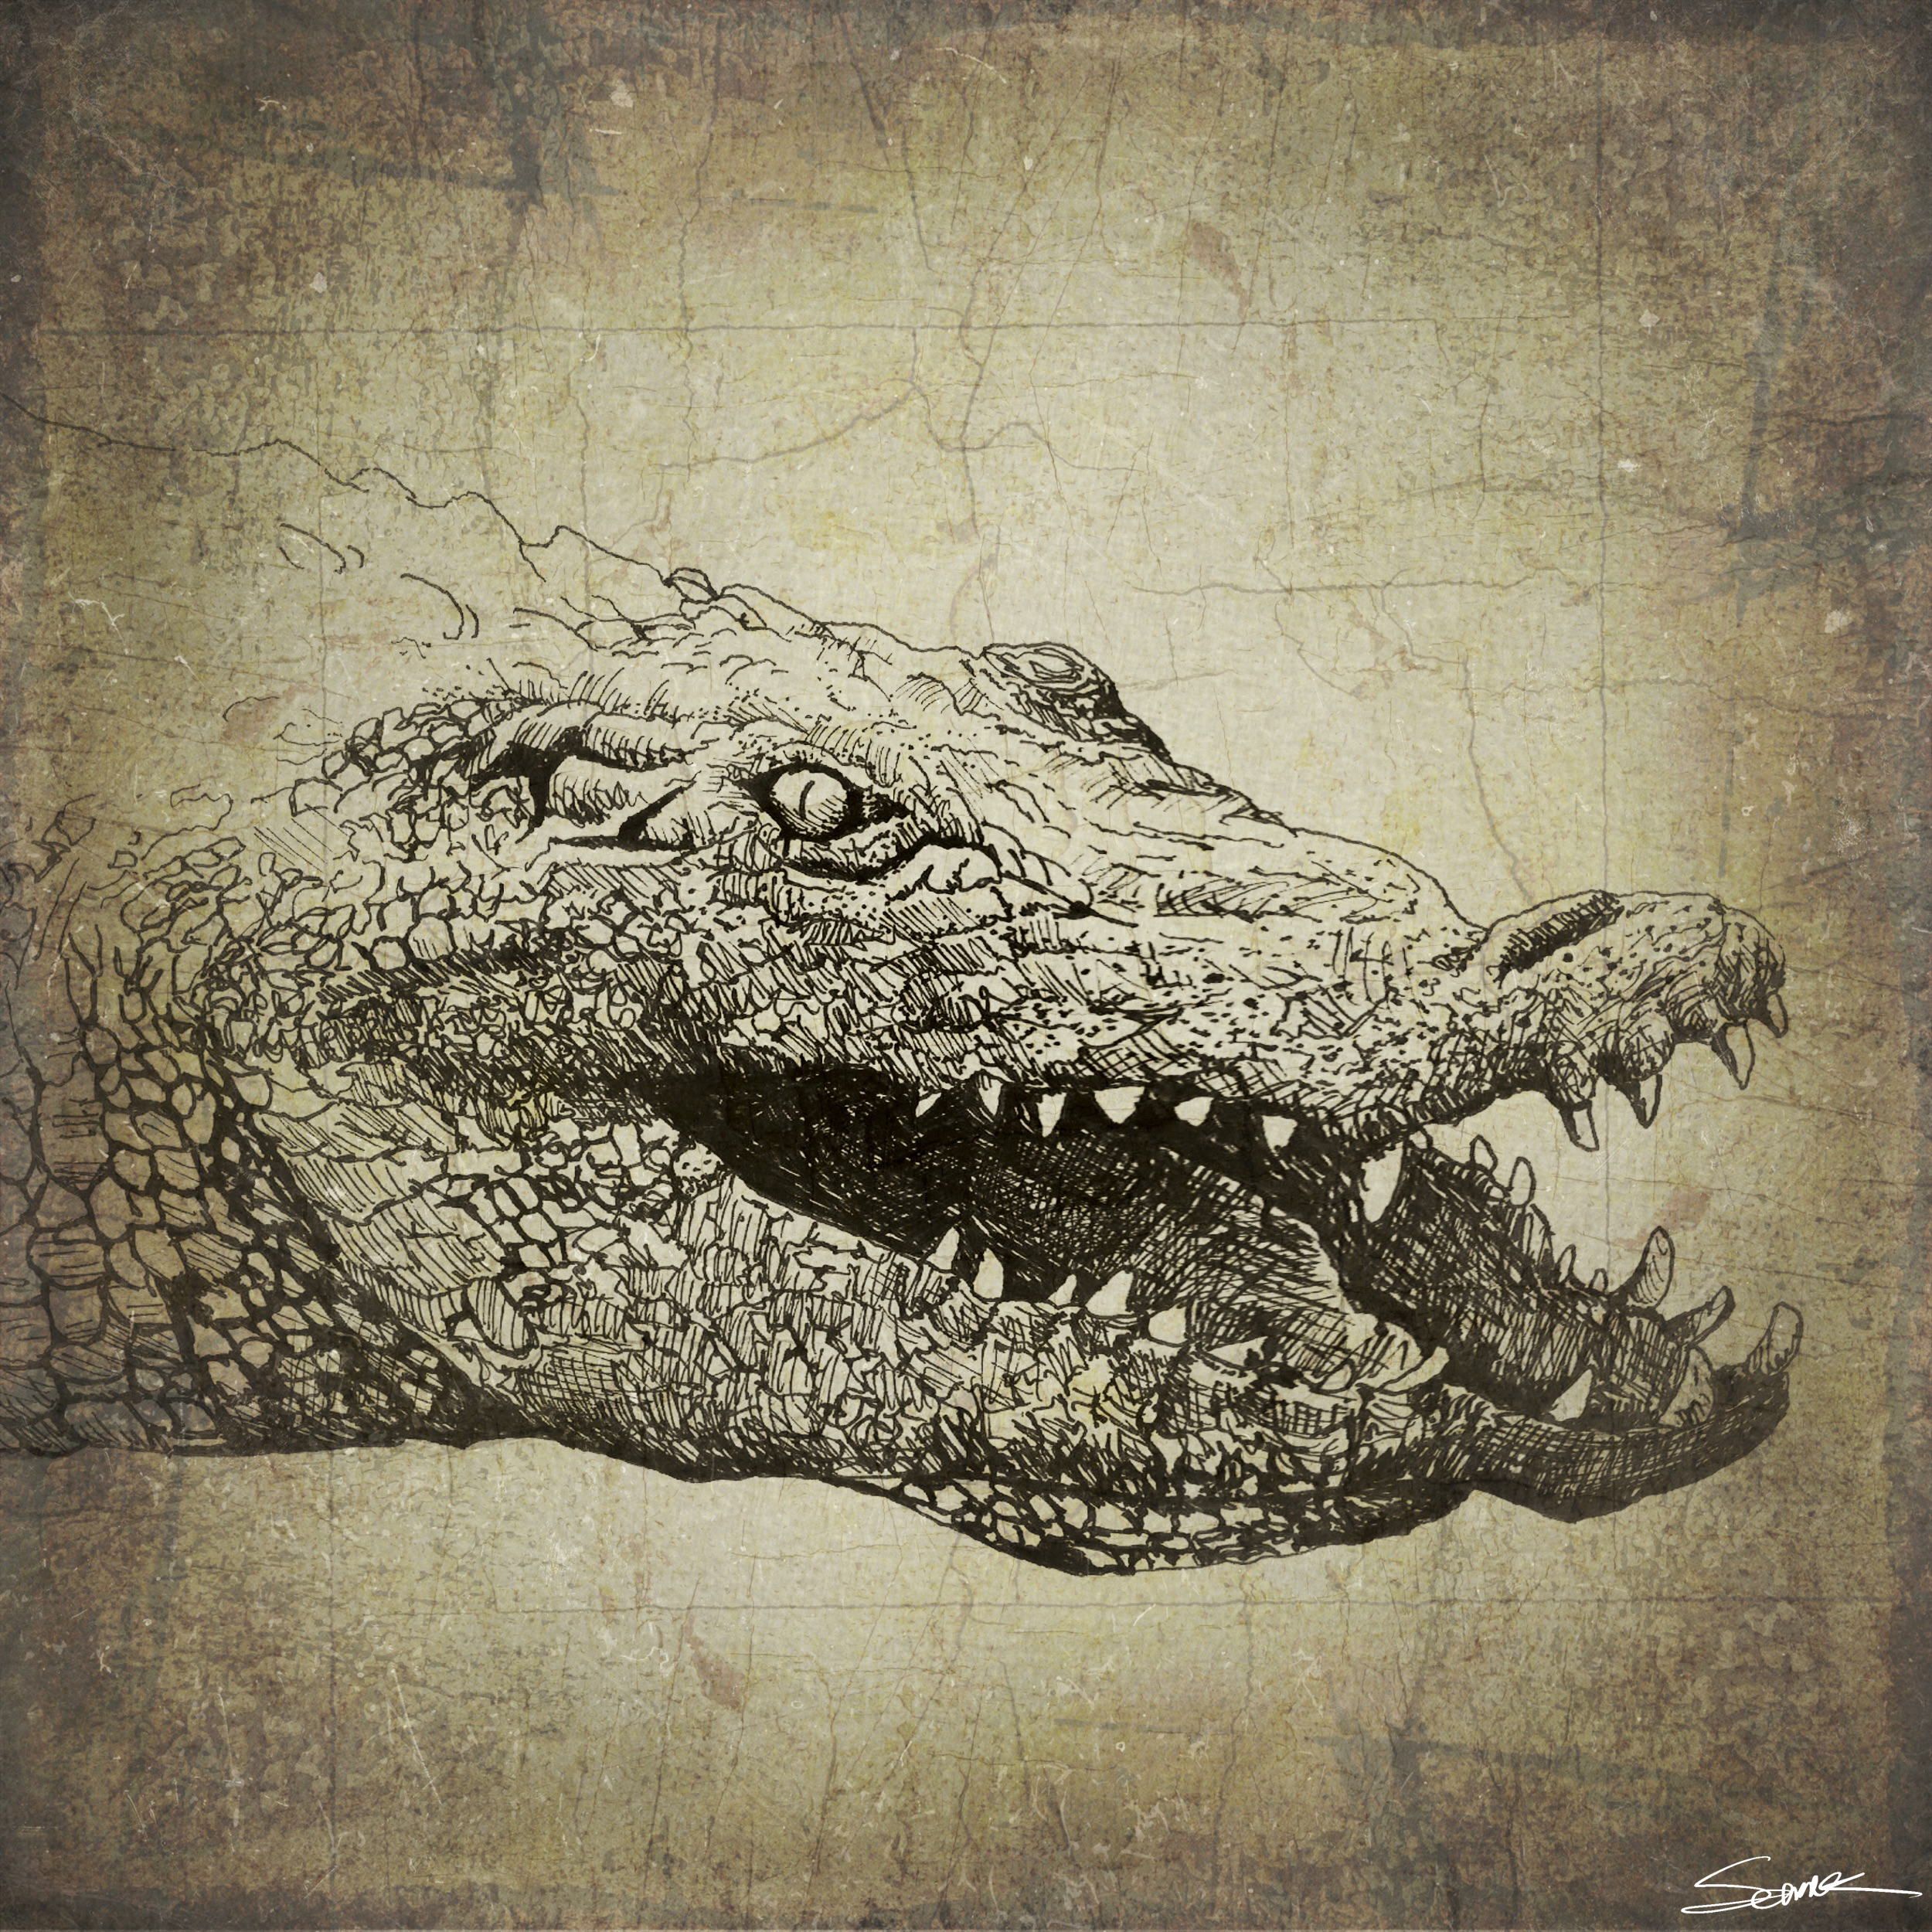 Catch Ya Later Alligator